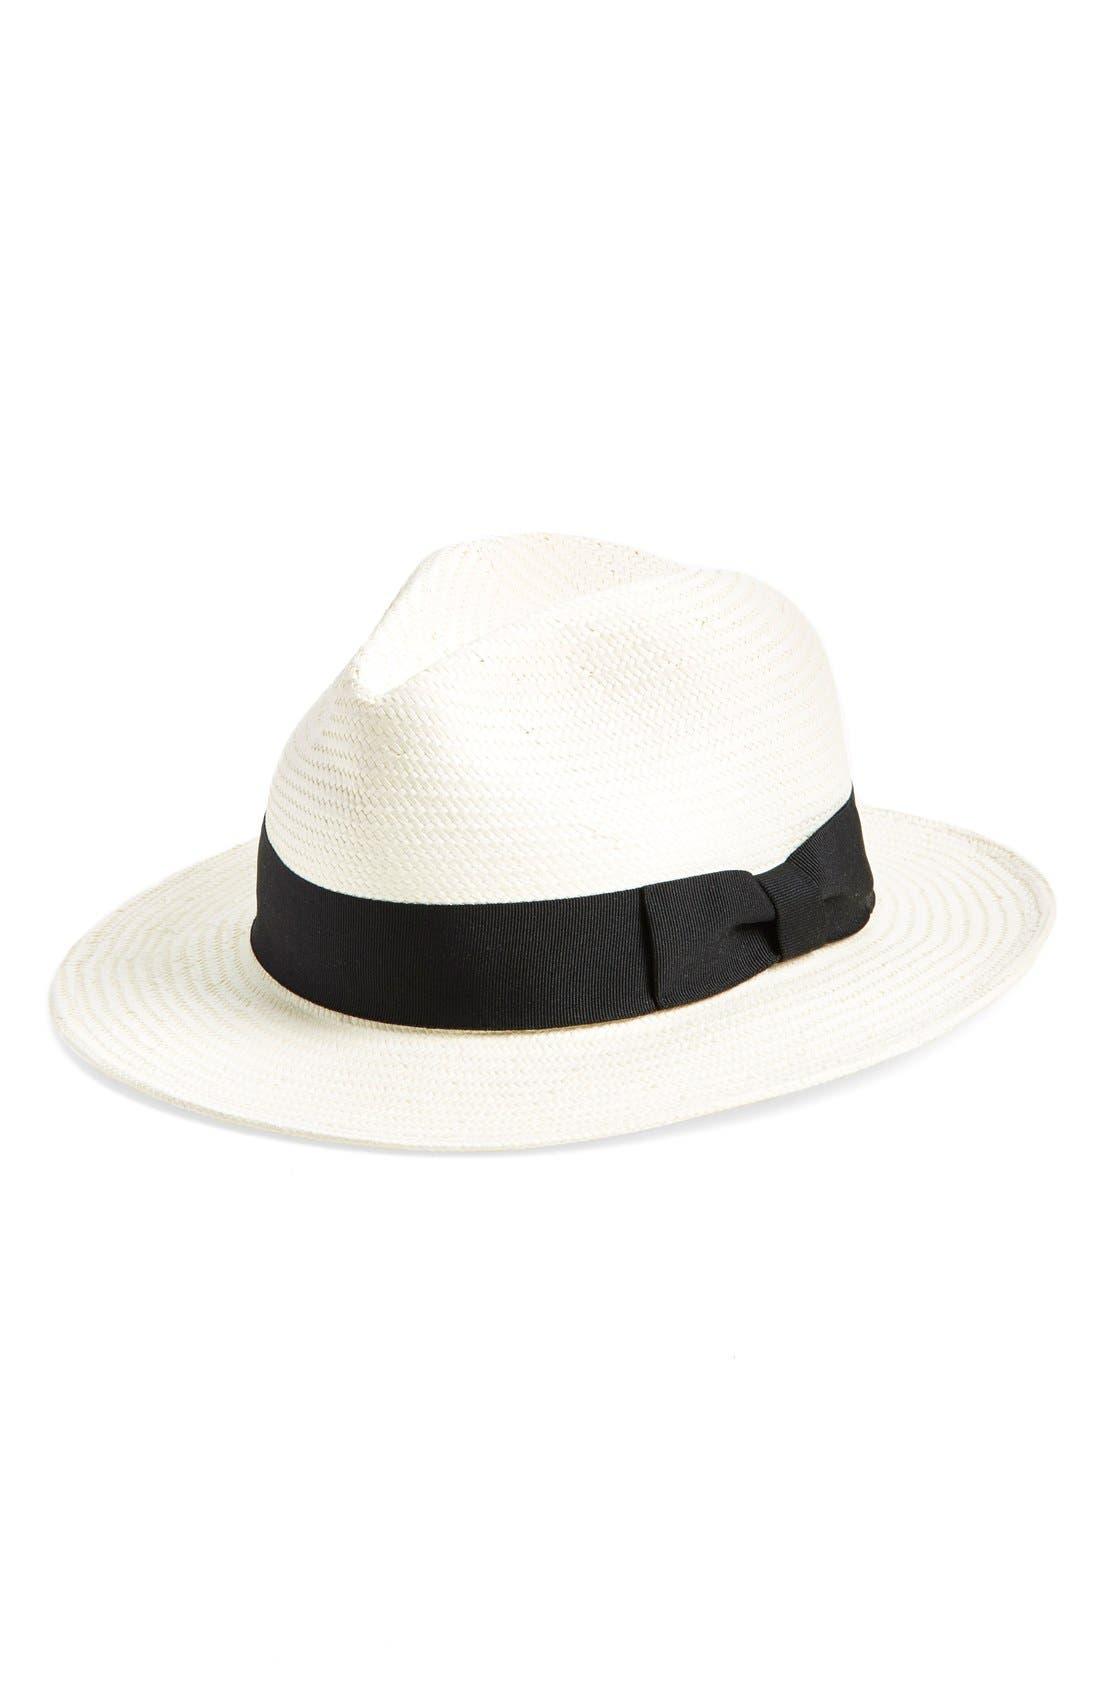 Main Image - Madewell Panama Hat